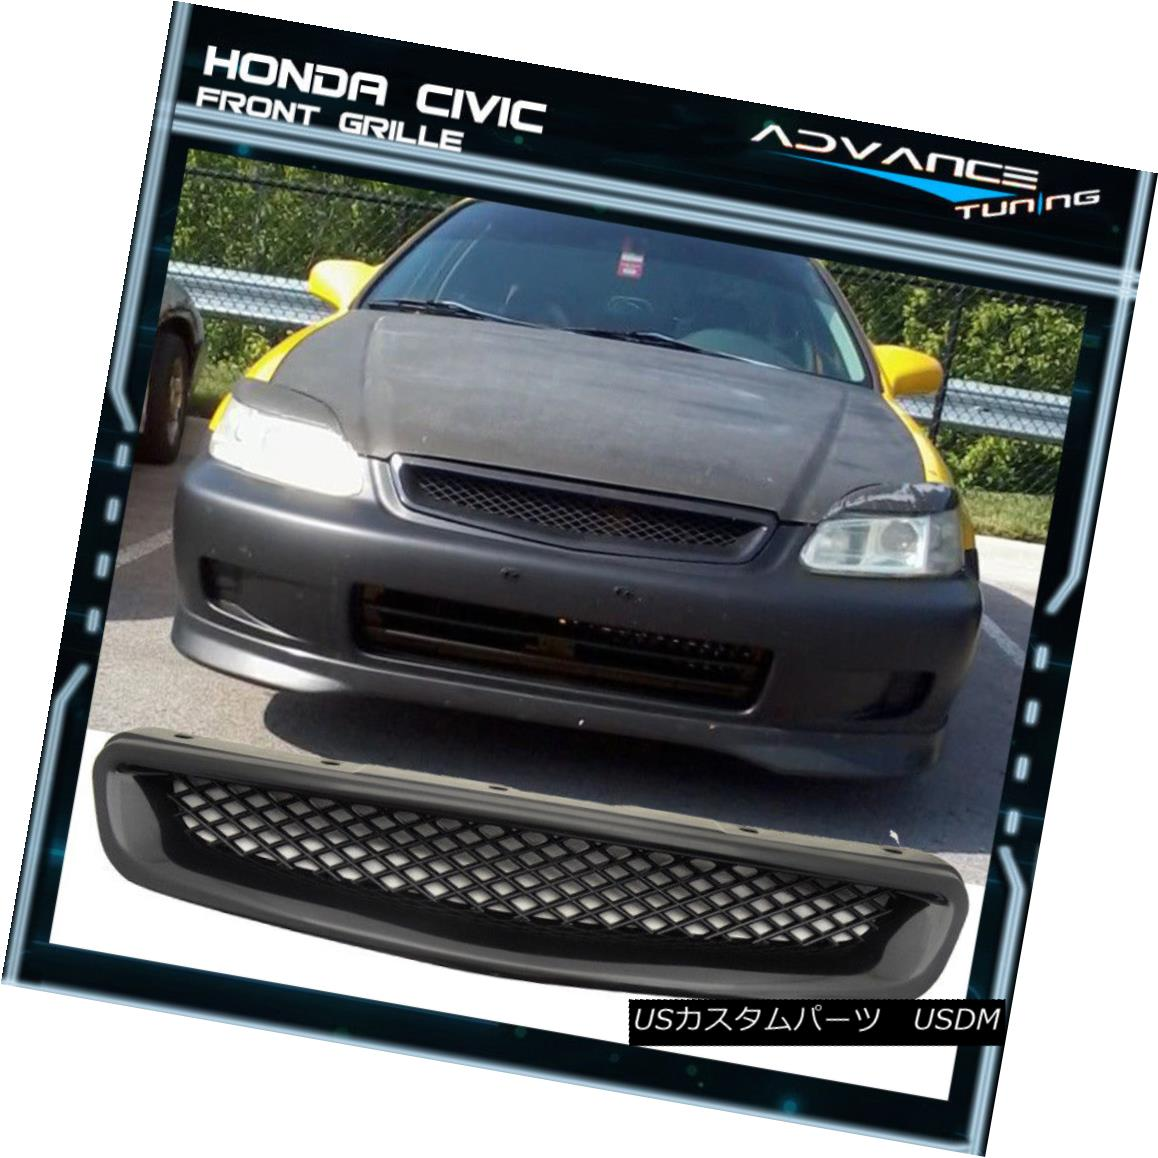 Honda Civic CX VX 92 94 96 98 99 00 D//S Brake Rotors F